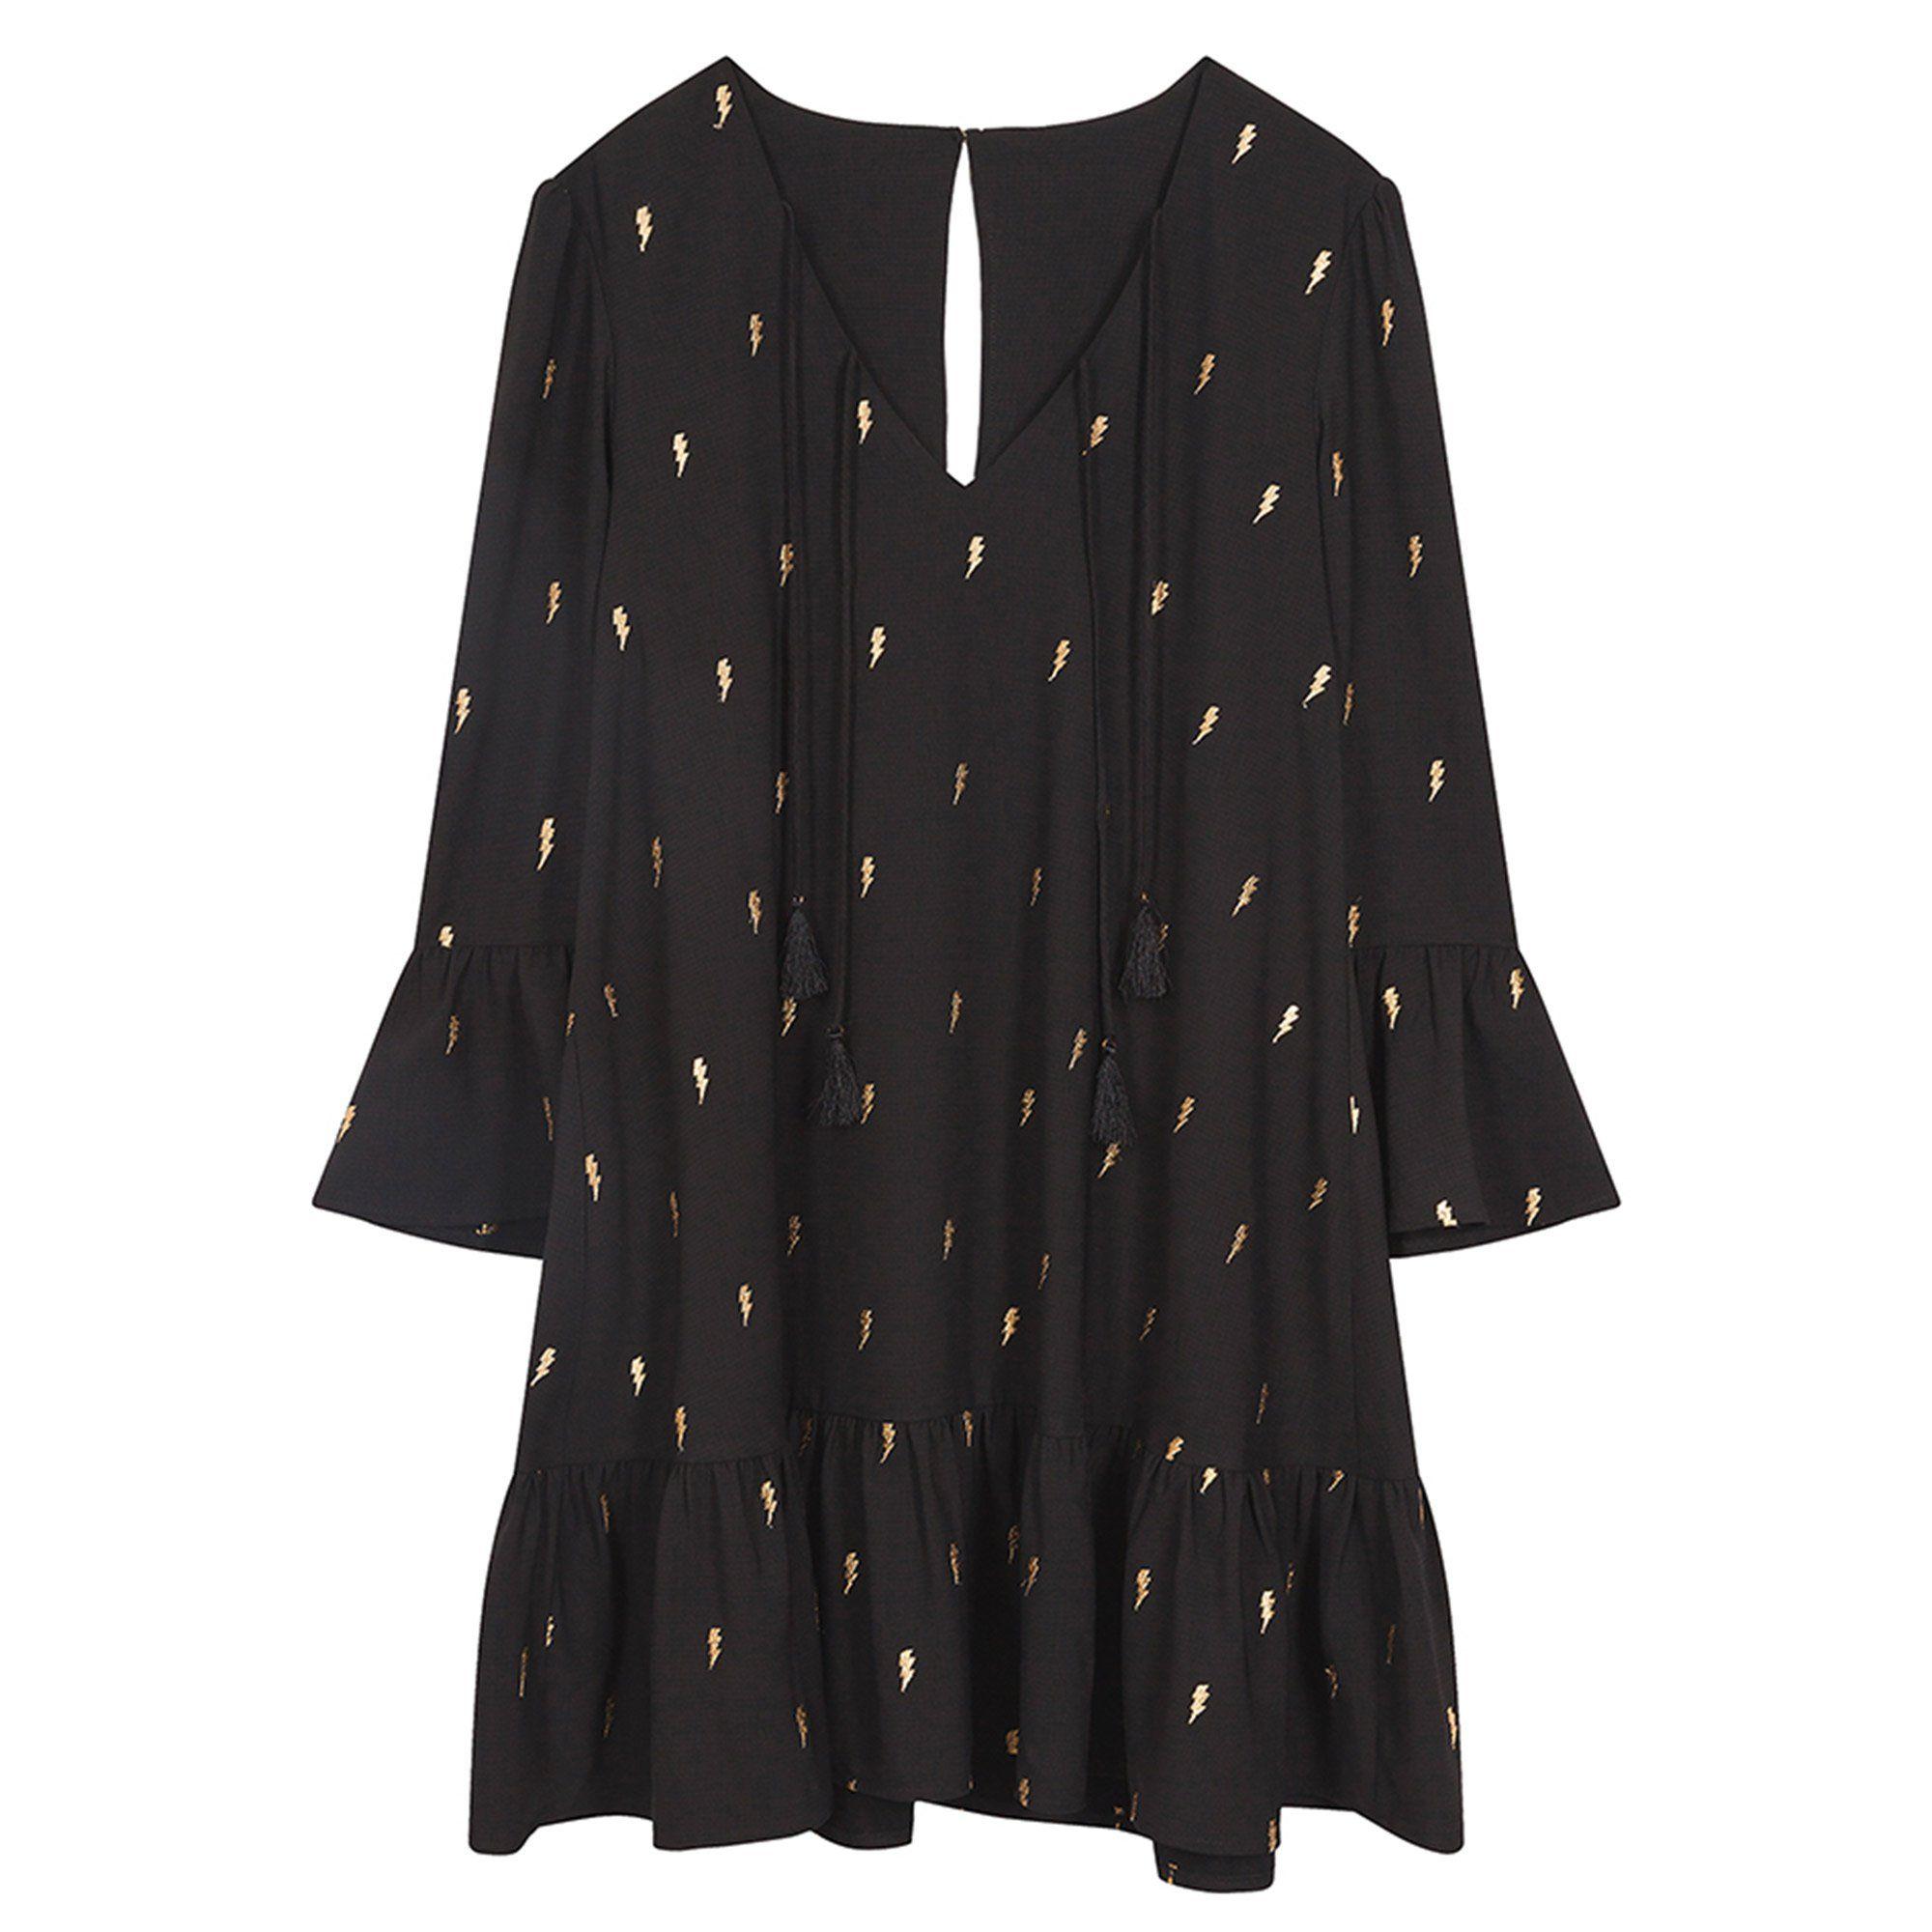 cheap for discount finest selection 100% authentic Robe tendance automne hiver : une robe Amenapih en 2019 ...